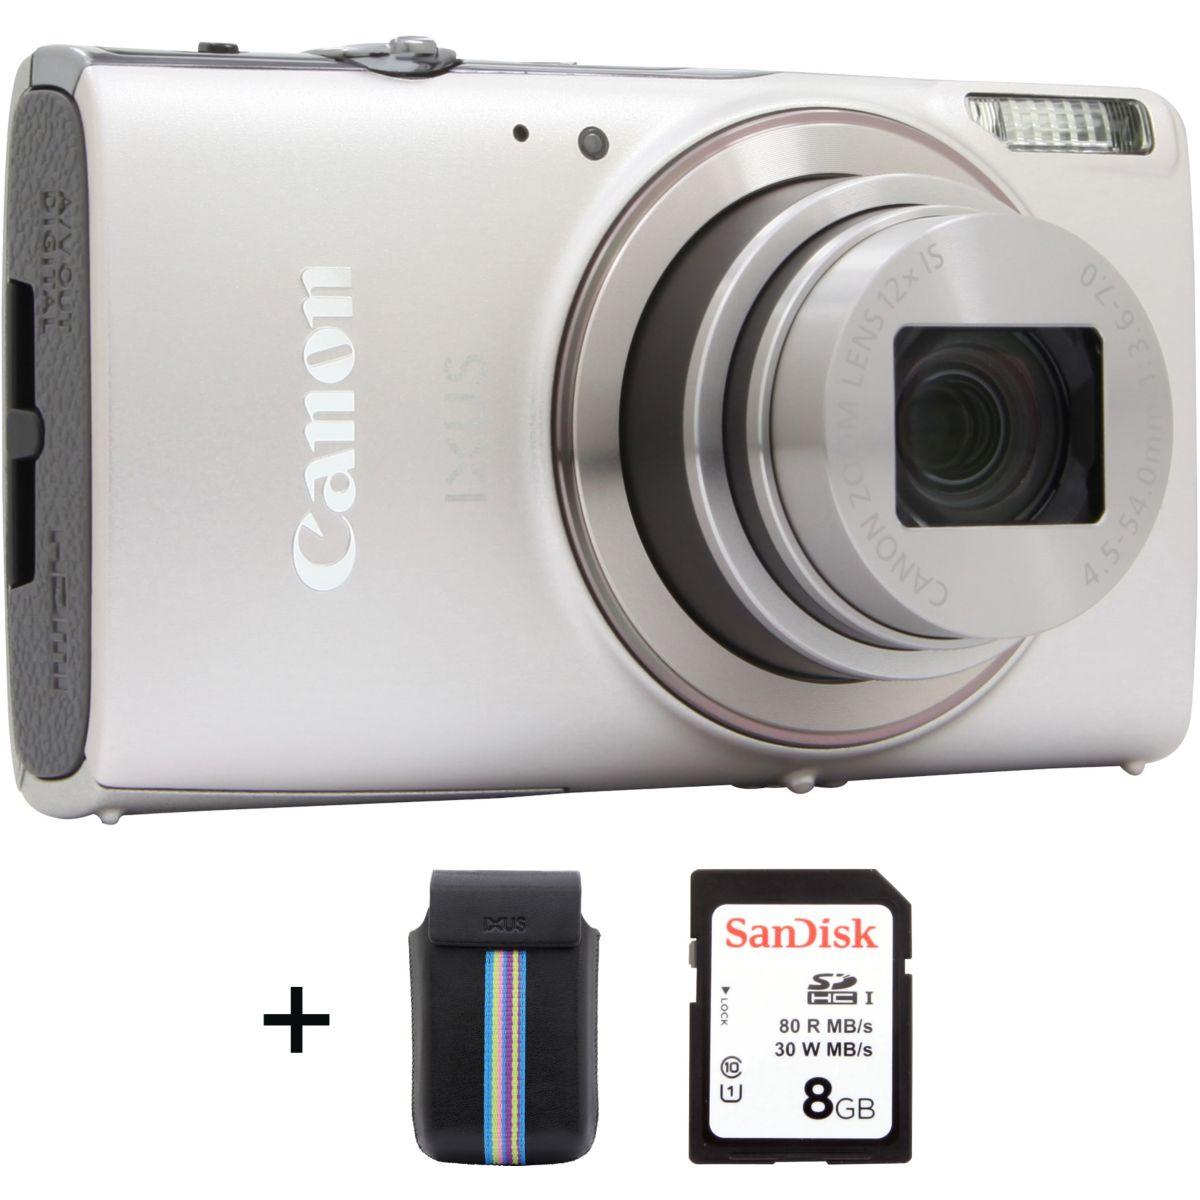 Appareil photo Compact CANON Ixus 285 HS Silver + Etui + SD 8G...